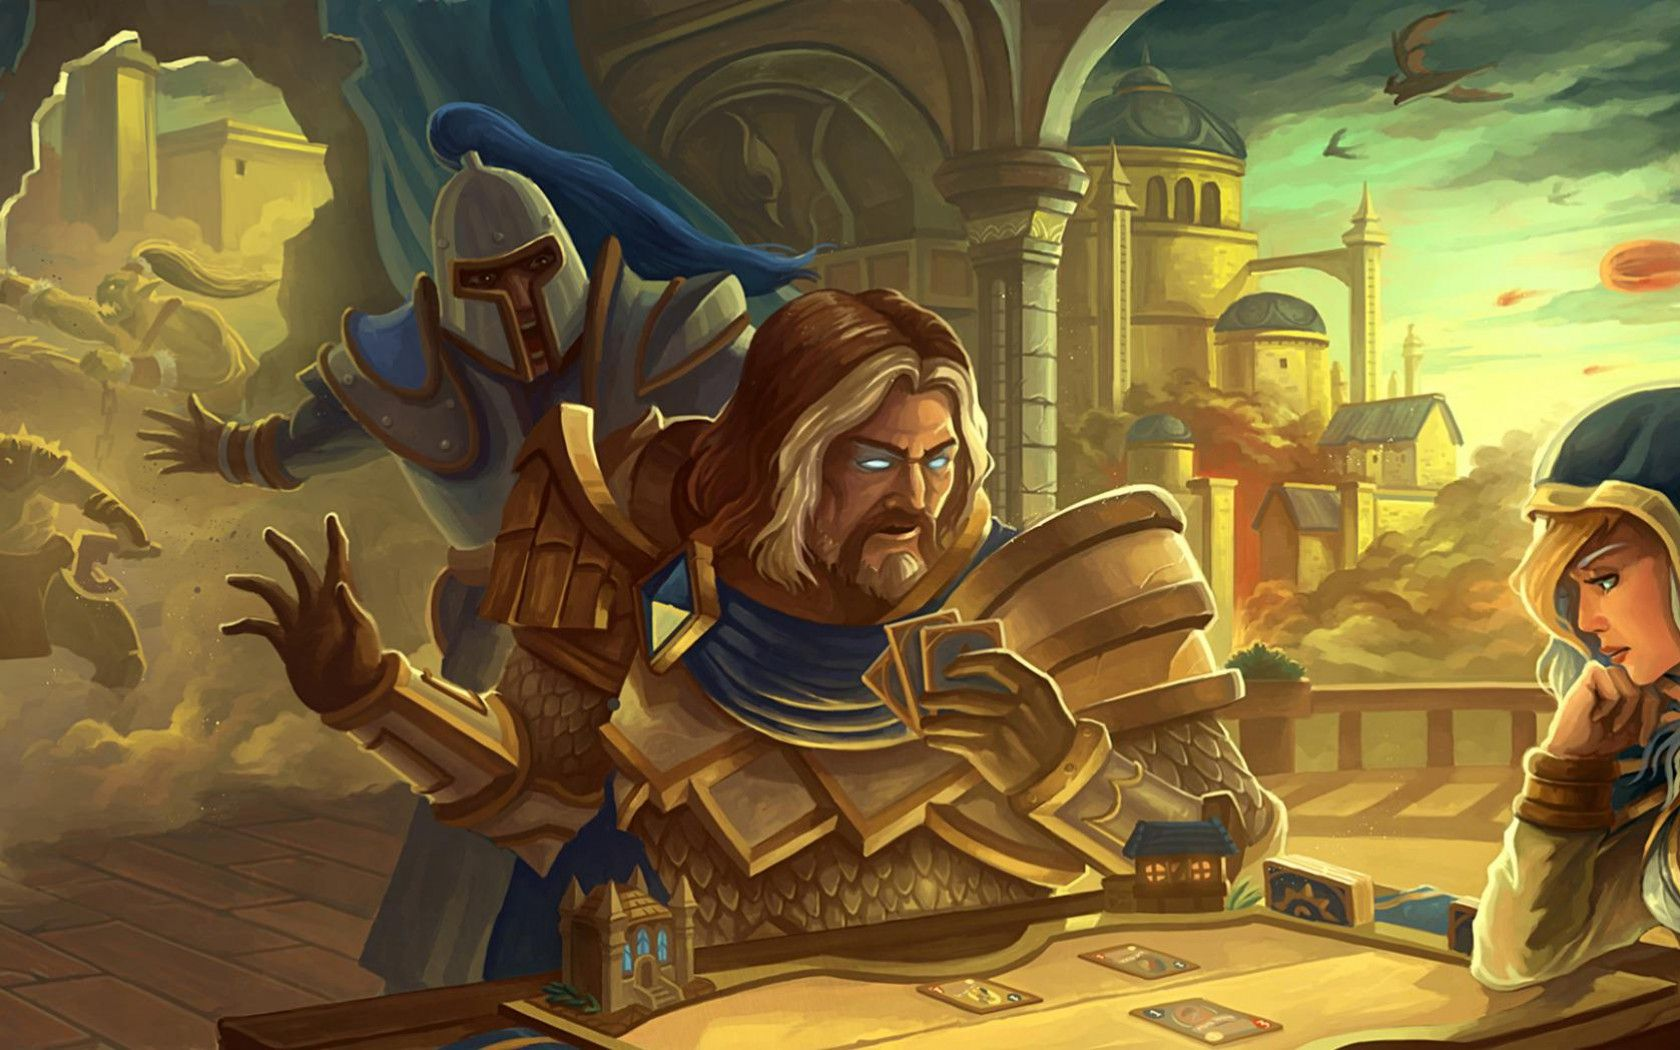 World Of Warcraft Paladin Wallpaper Wallpapers Kid 1280 1024 Wow Paladin Wallpaper 44 Wallpa Jaina Proudmoore Hearthstone Wallpaper World Of Warcraft Paladin